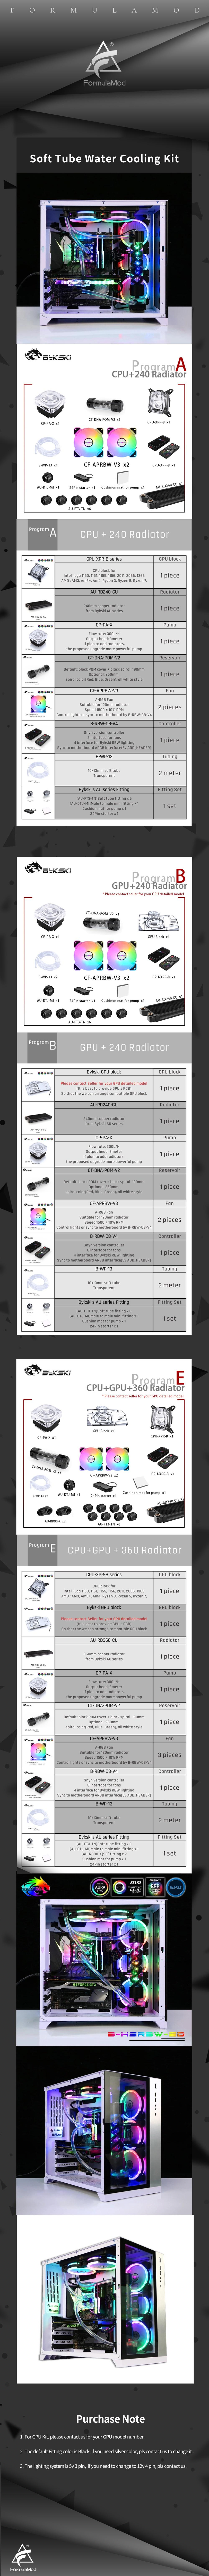 Bykski B-HSRBW-ED, RBW 5v 3pin Soft Tube Program Kits, Multiple Programs Customizable Modification For Intel/AMD Cooling KitBykski B-HSRBW-ED, RBW 5v 3pin Soft Tube Program Kits, Multiple Programs Customizable Modification For Intel/AMD Cooling KitBykski B-HSRBW-ED,Bykski RBW 5v 3pin Soft Tube Program,Bykski Intel/AMD Cooling Kit